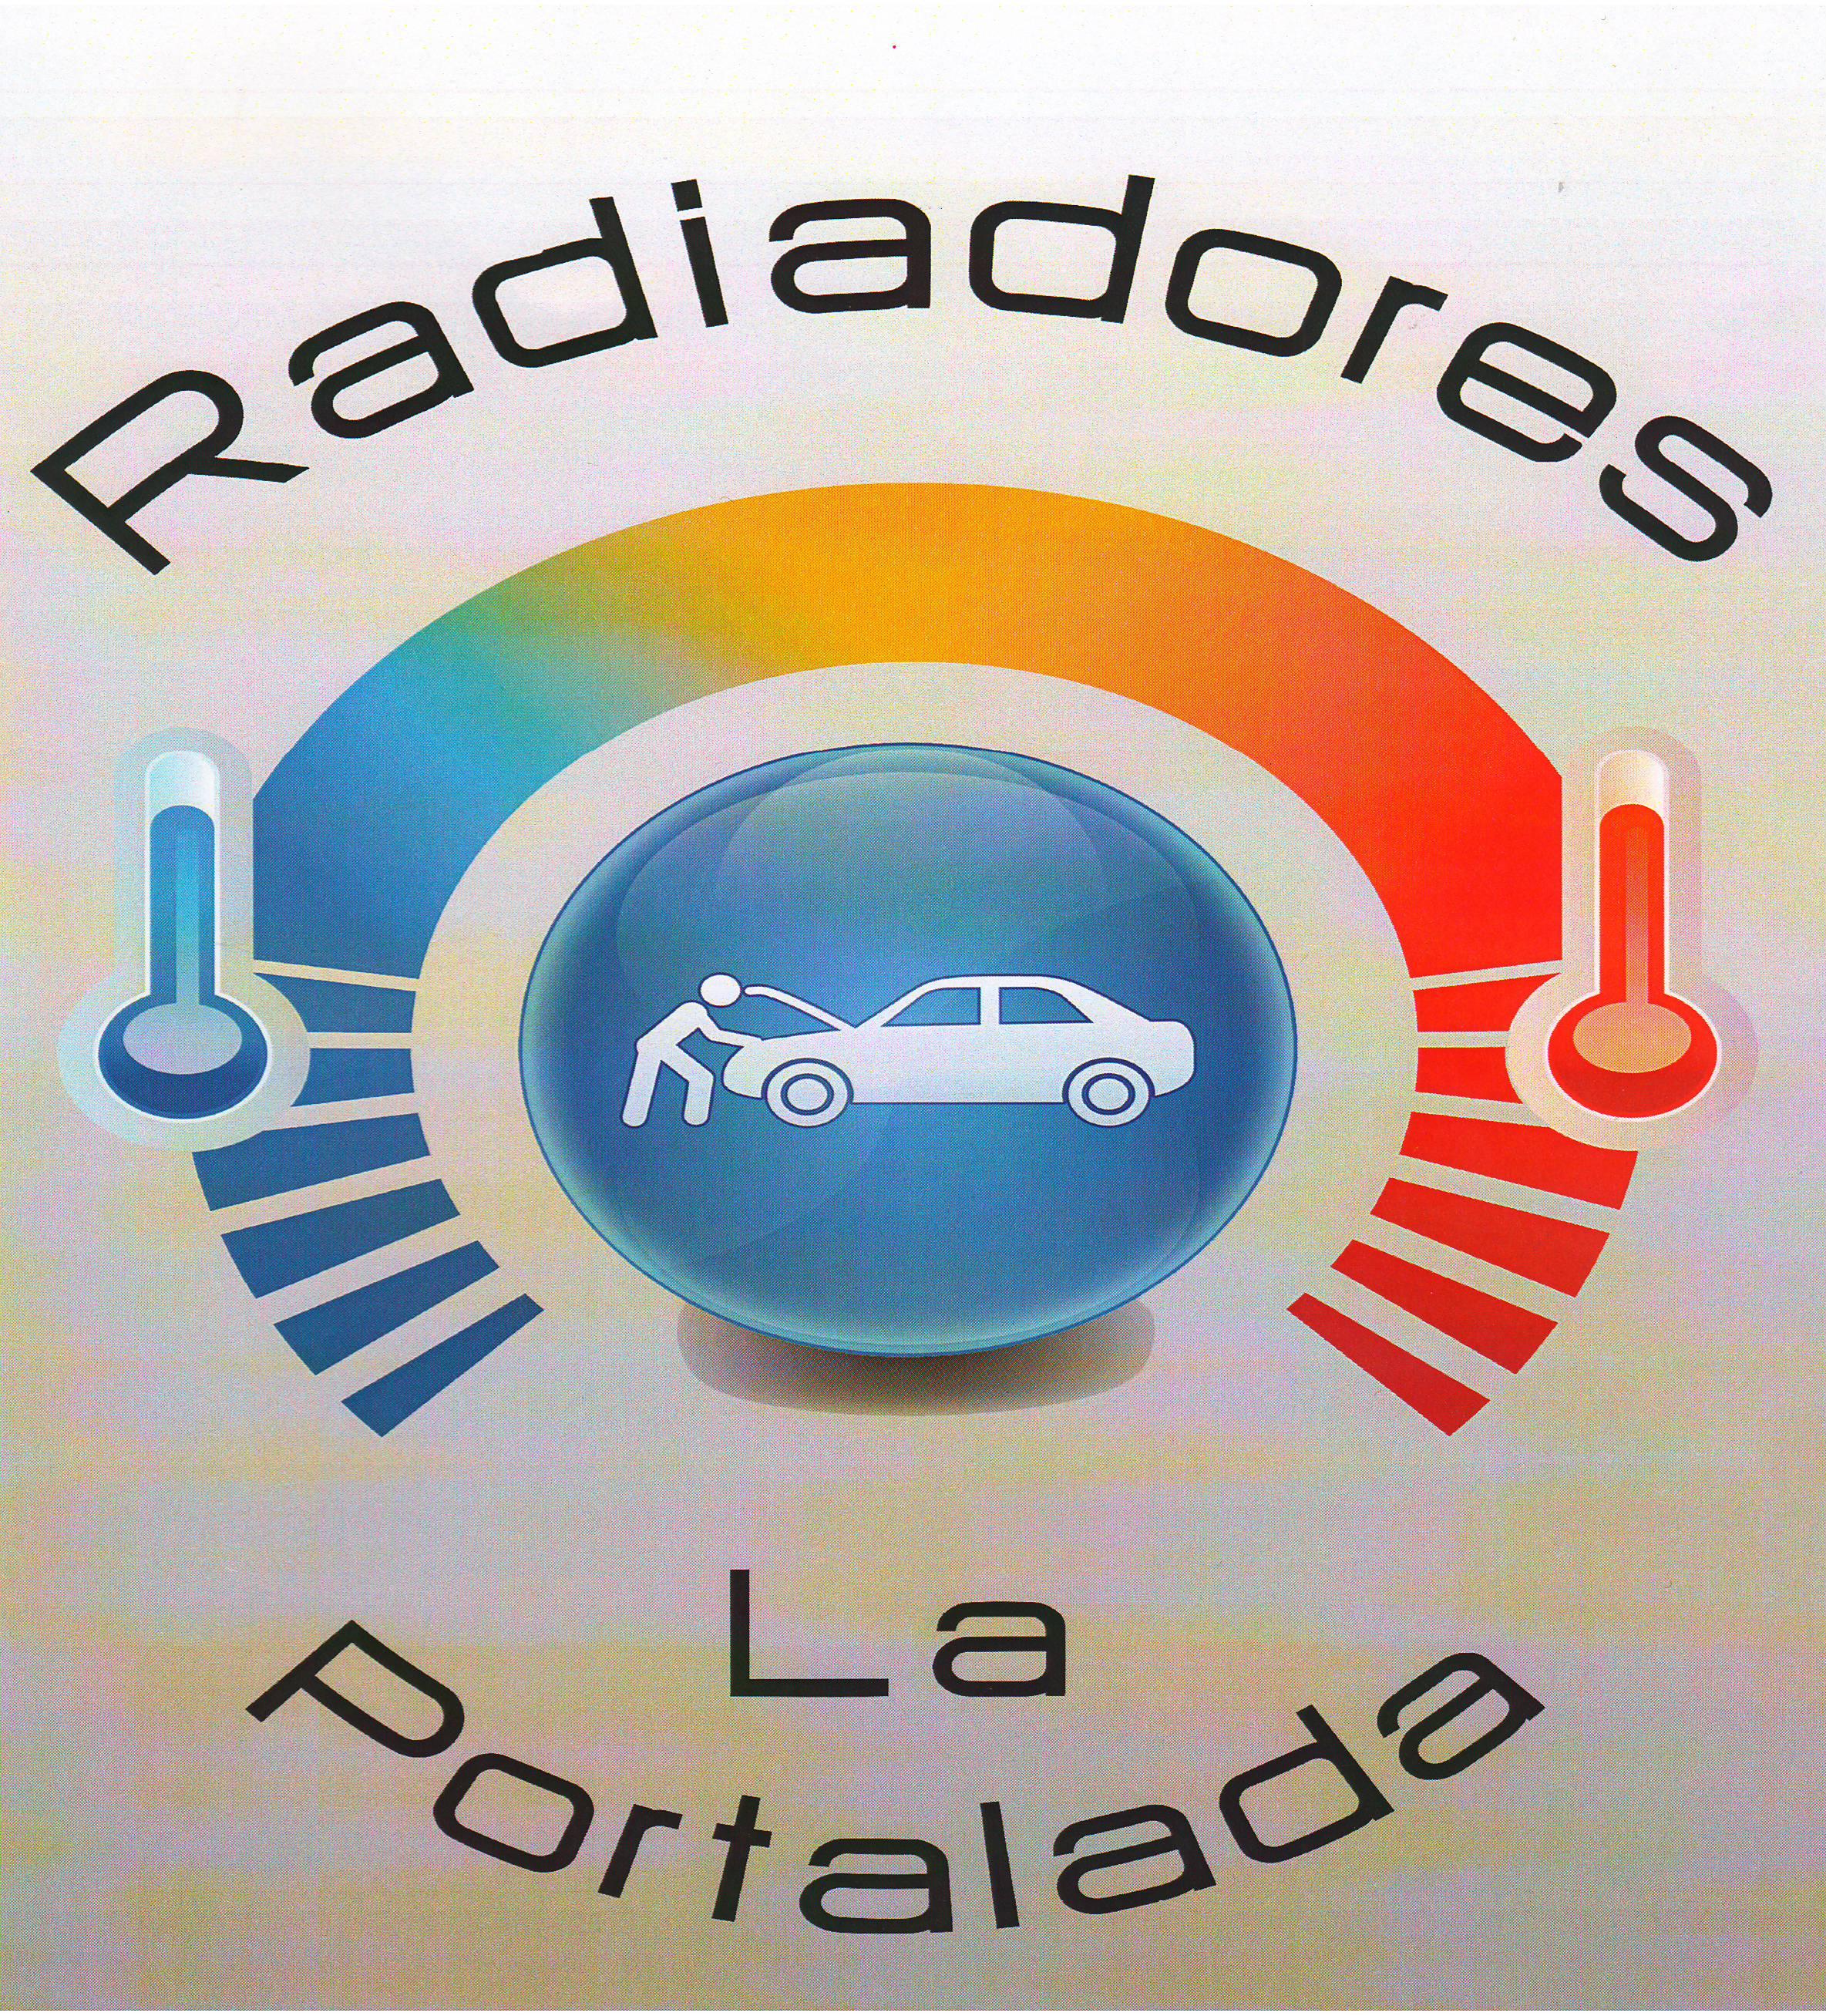 Radiadores La Portalada 2